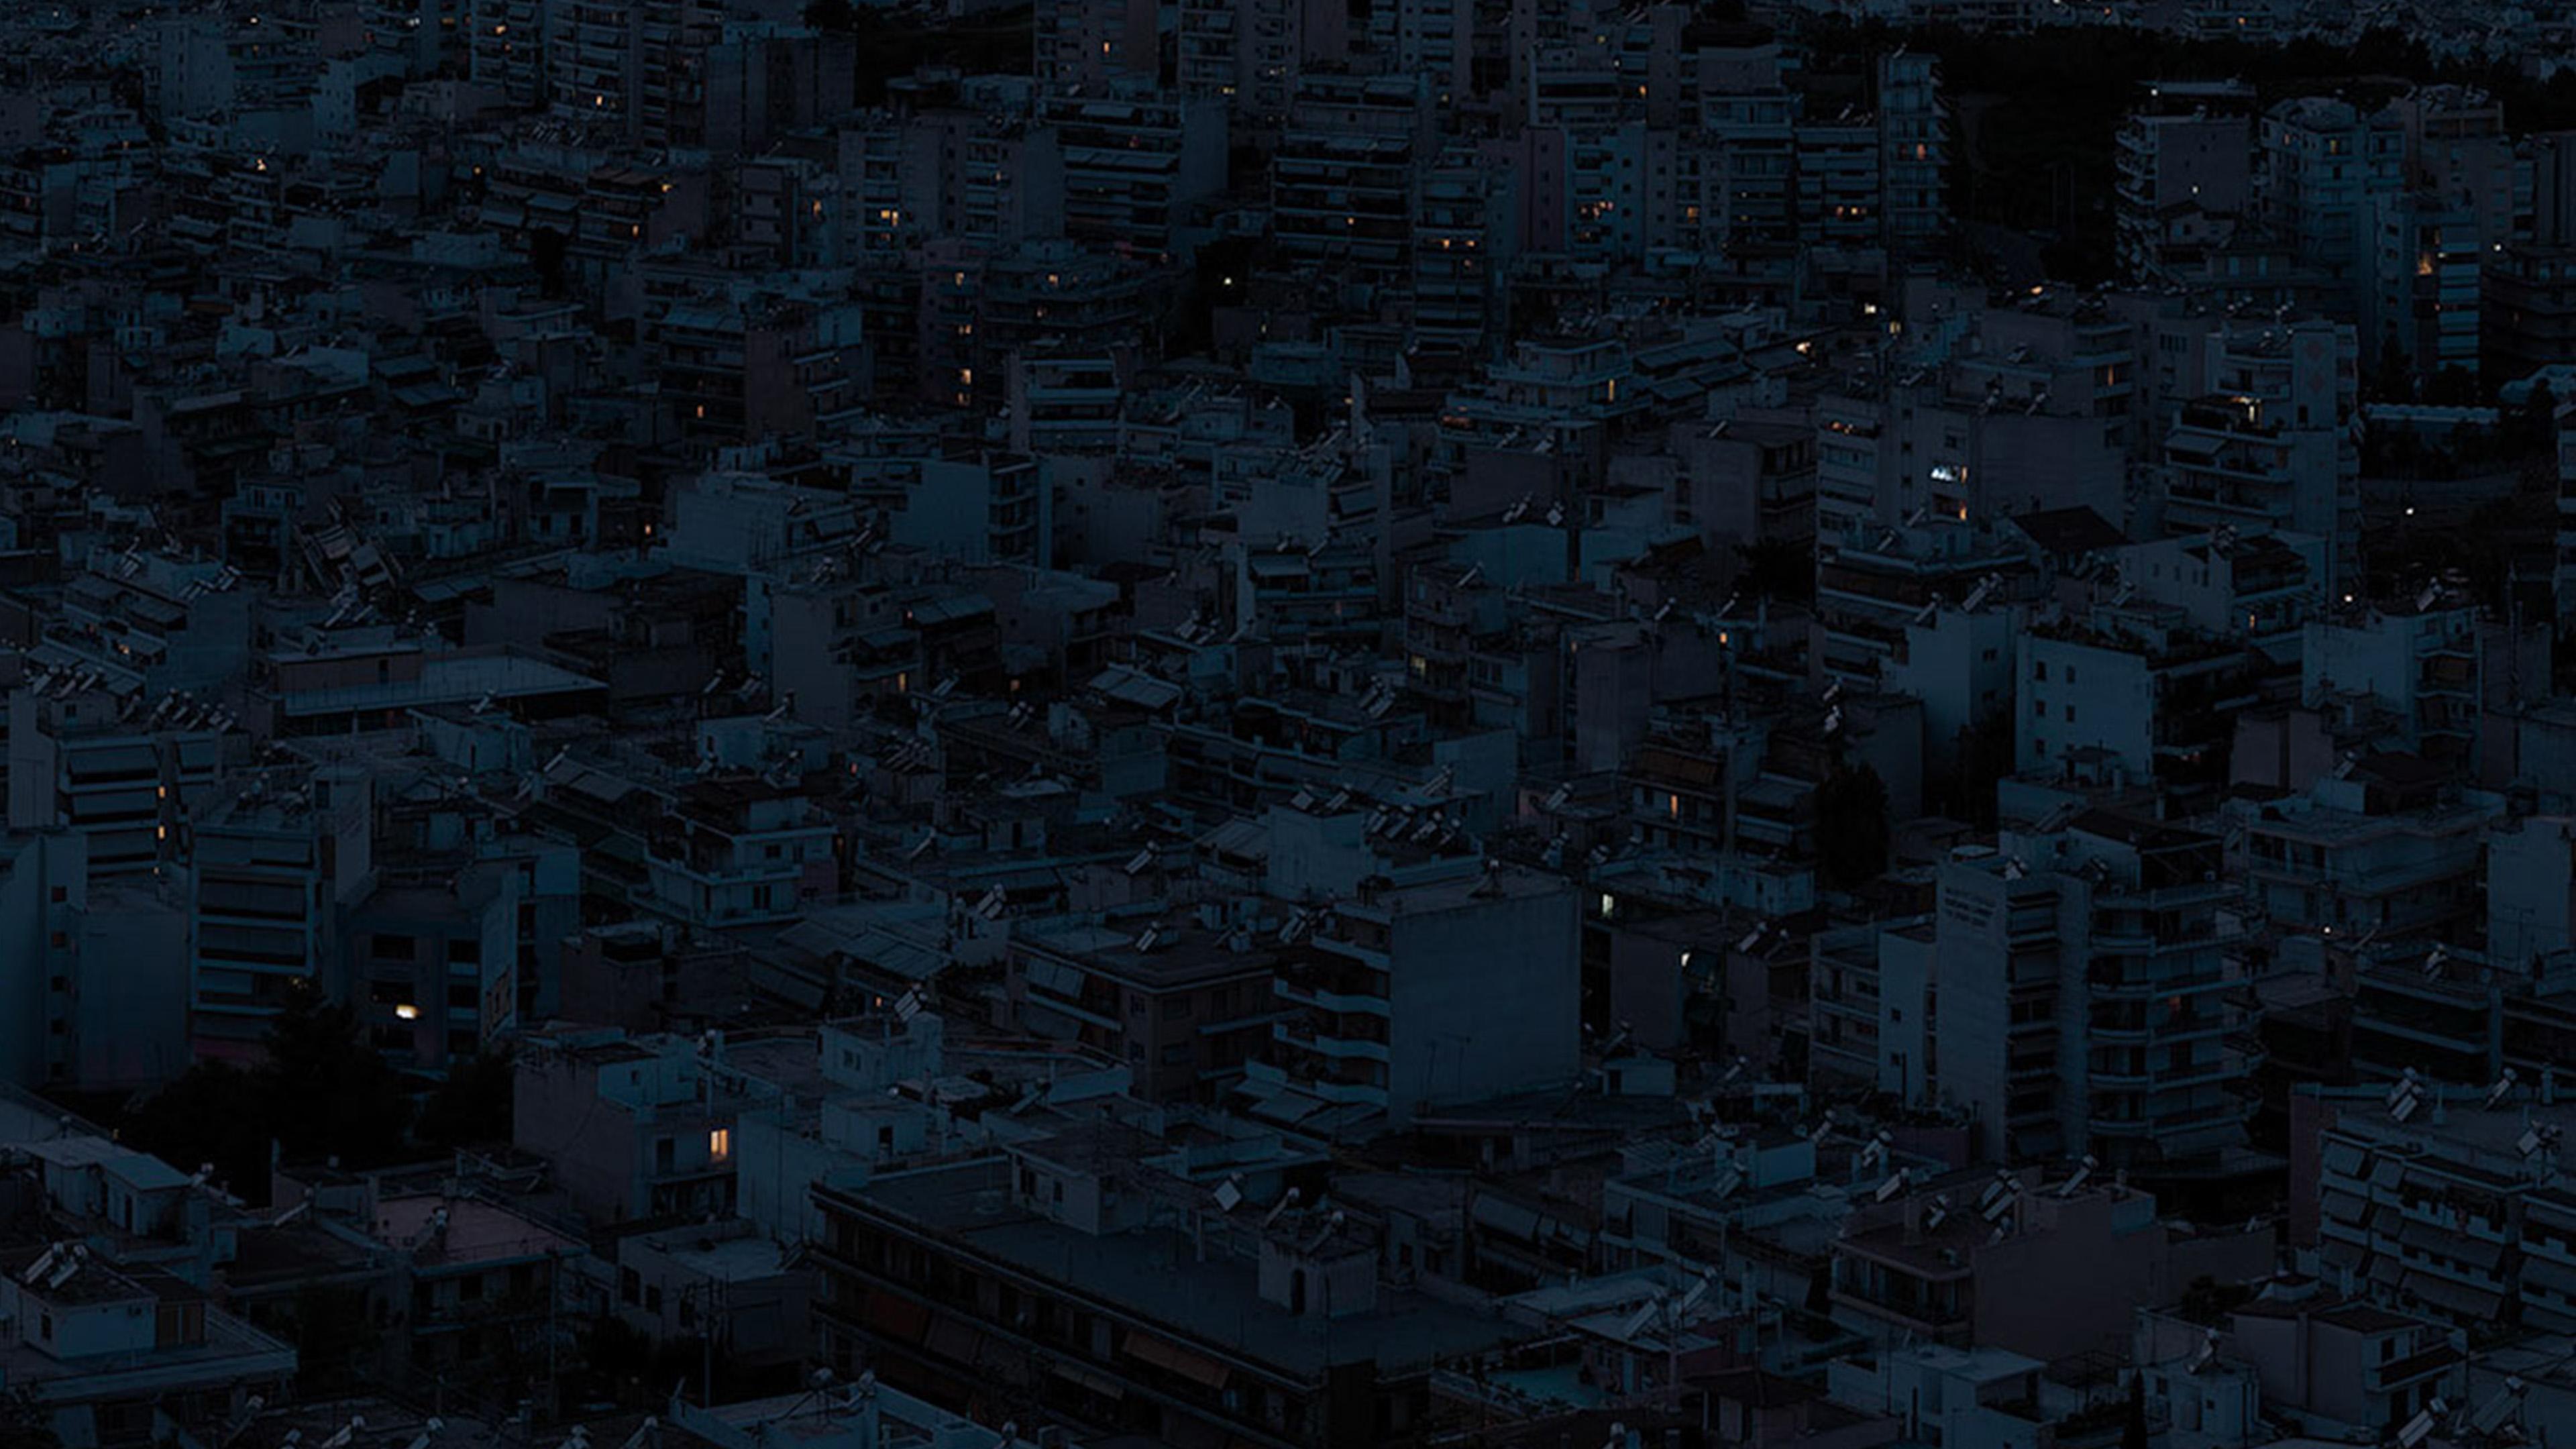 White Blue Wallpaper Hd Be37 Dark City Night Art Illustration Wallpaper